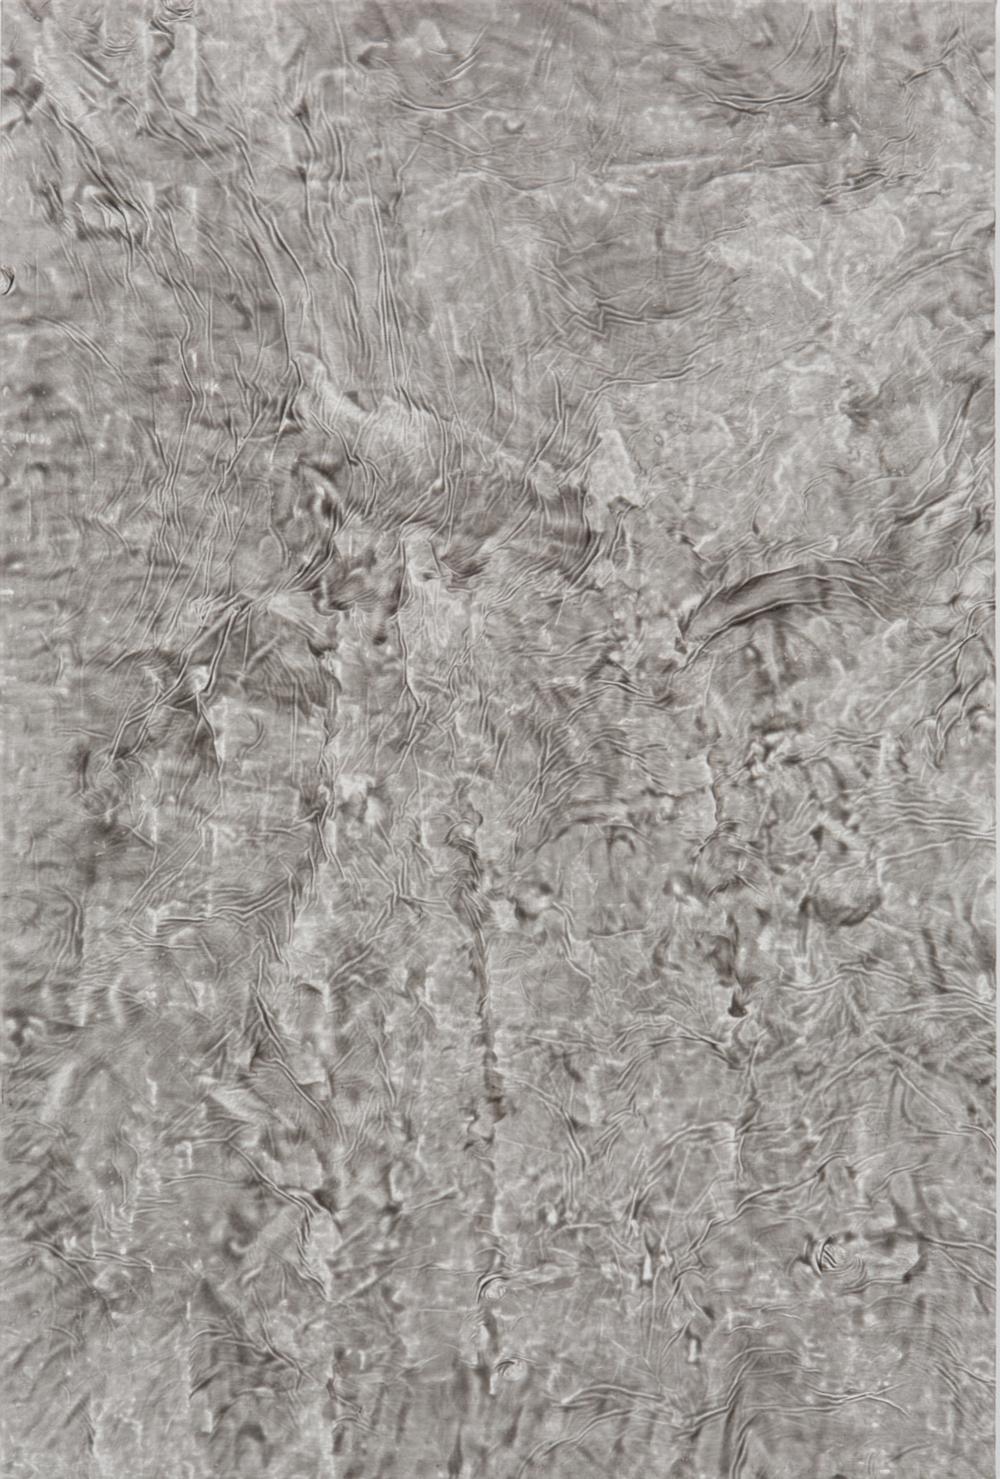 Acrylic on canvas by CALLUM SCHUSTER